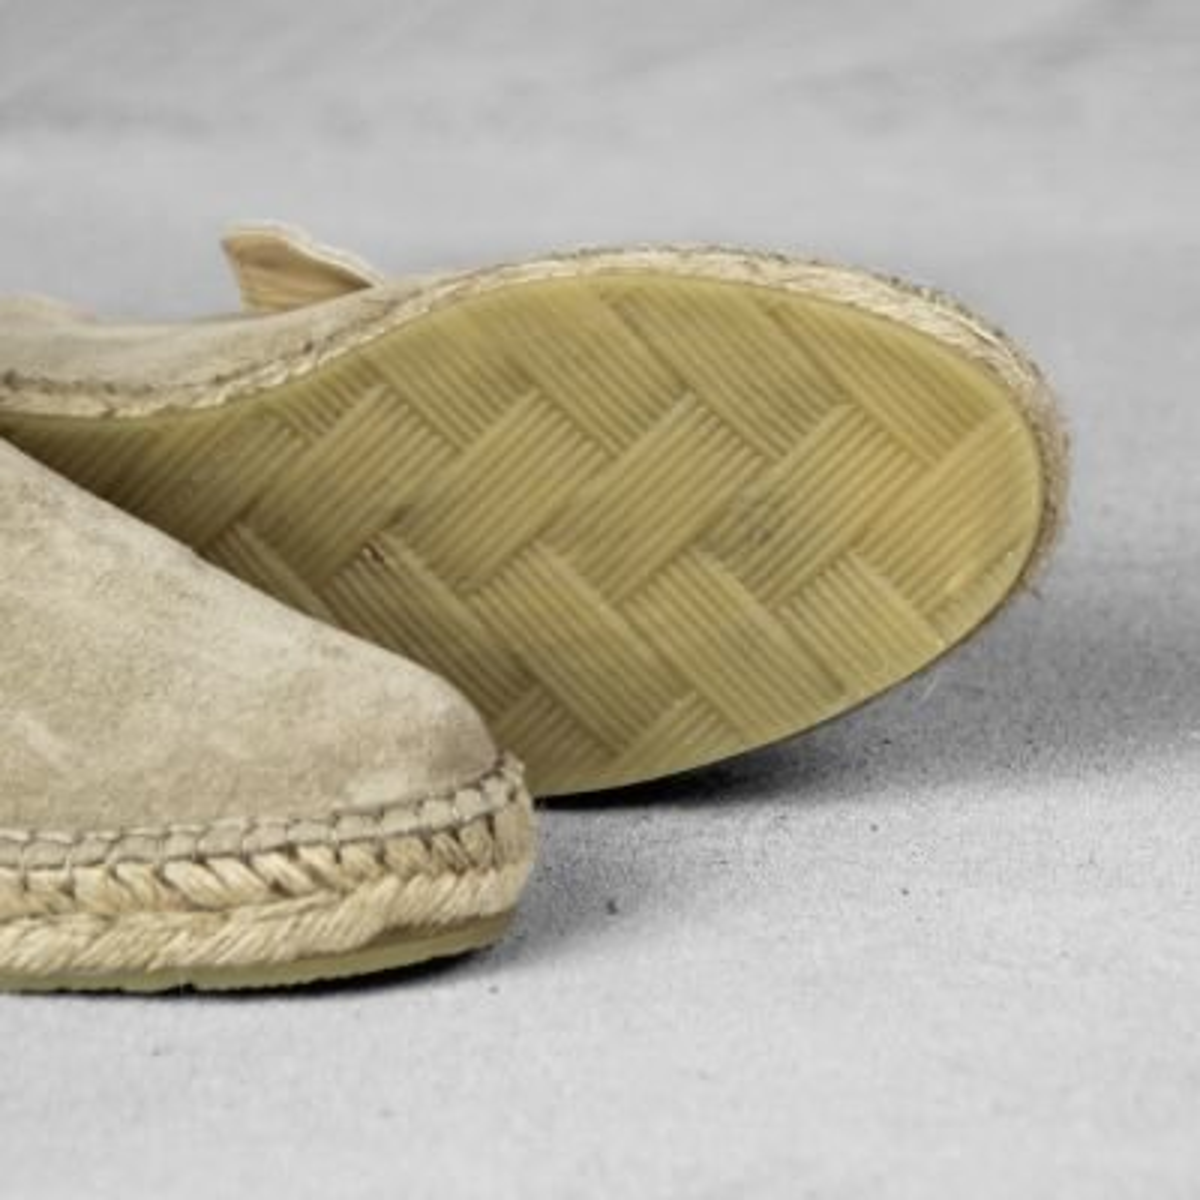 espadrille loafer shabbies amsterdam in taupekleurig suède 152020003 detail zool